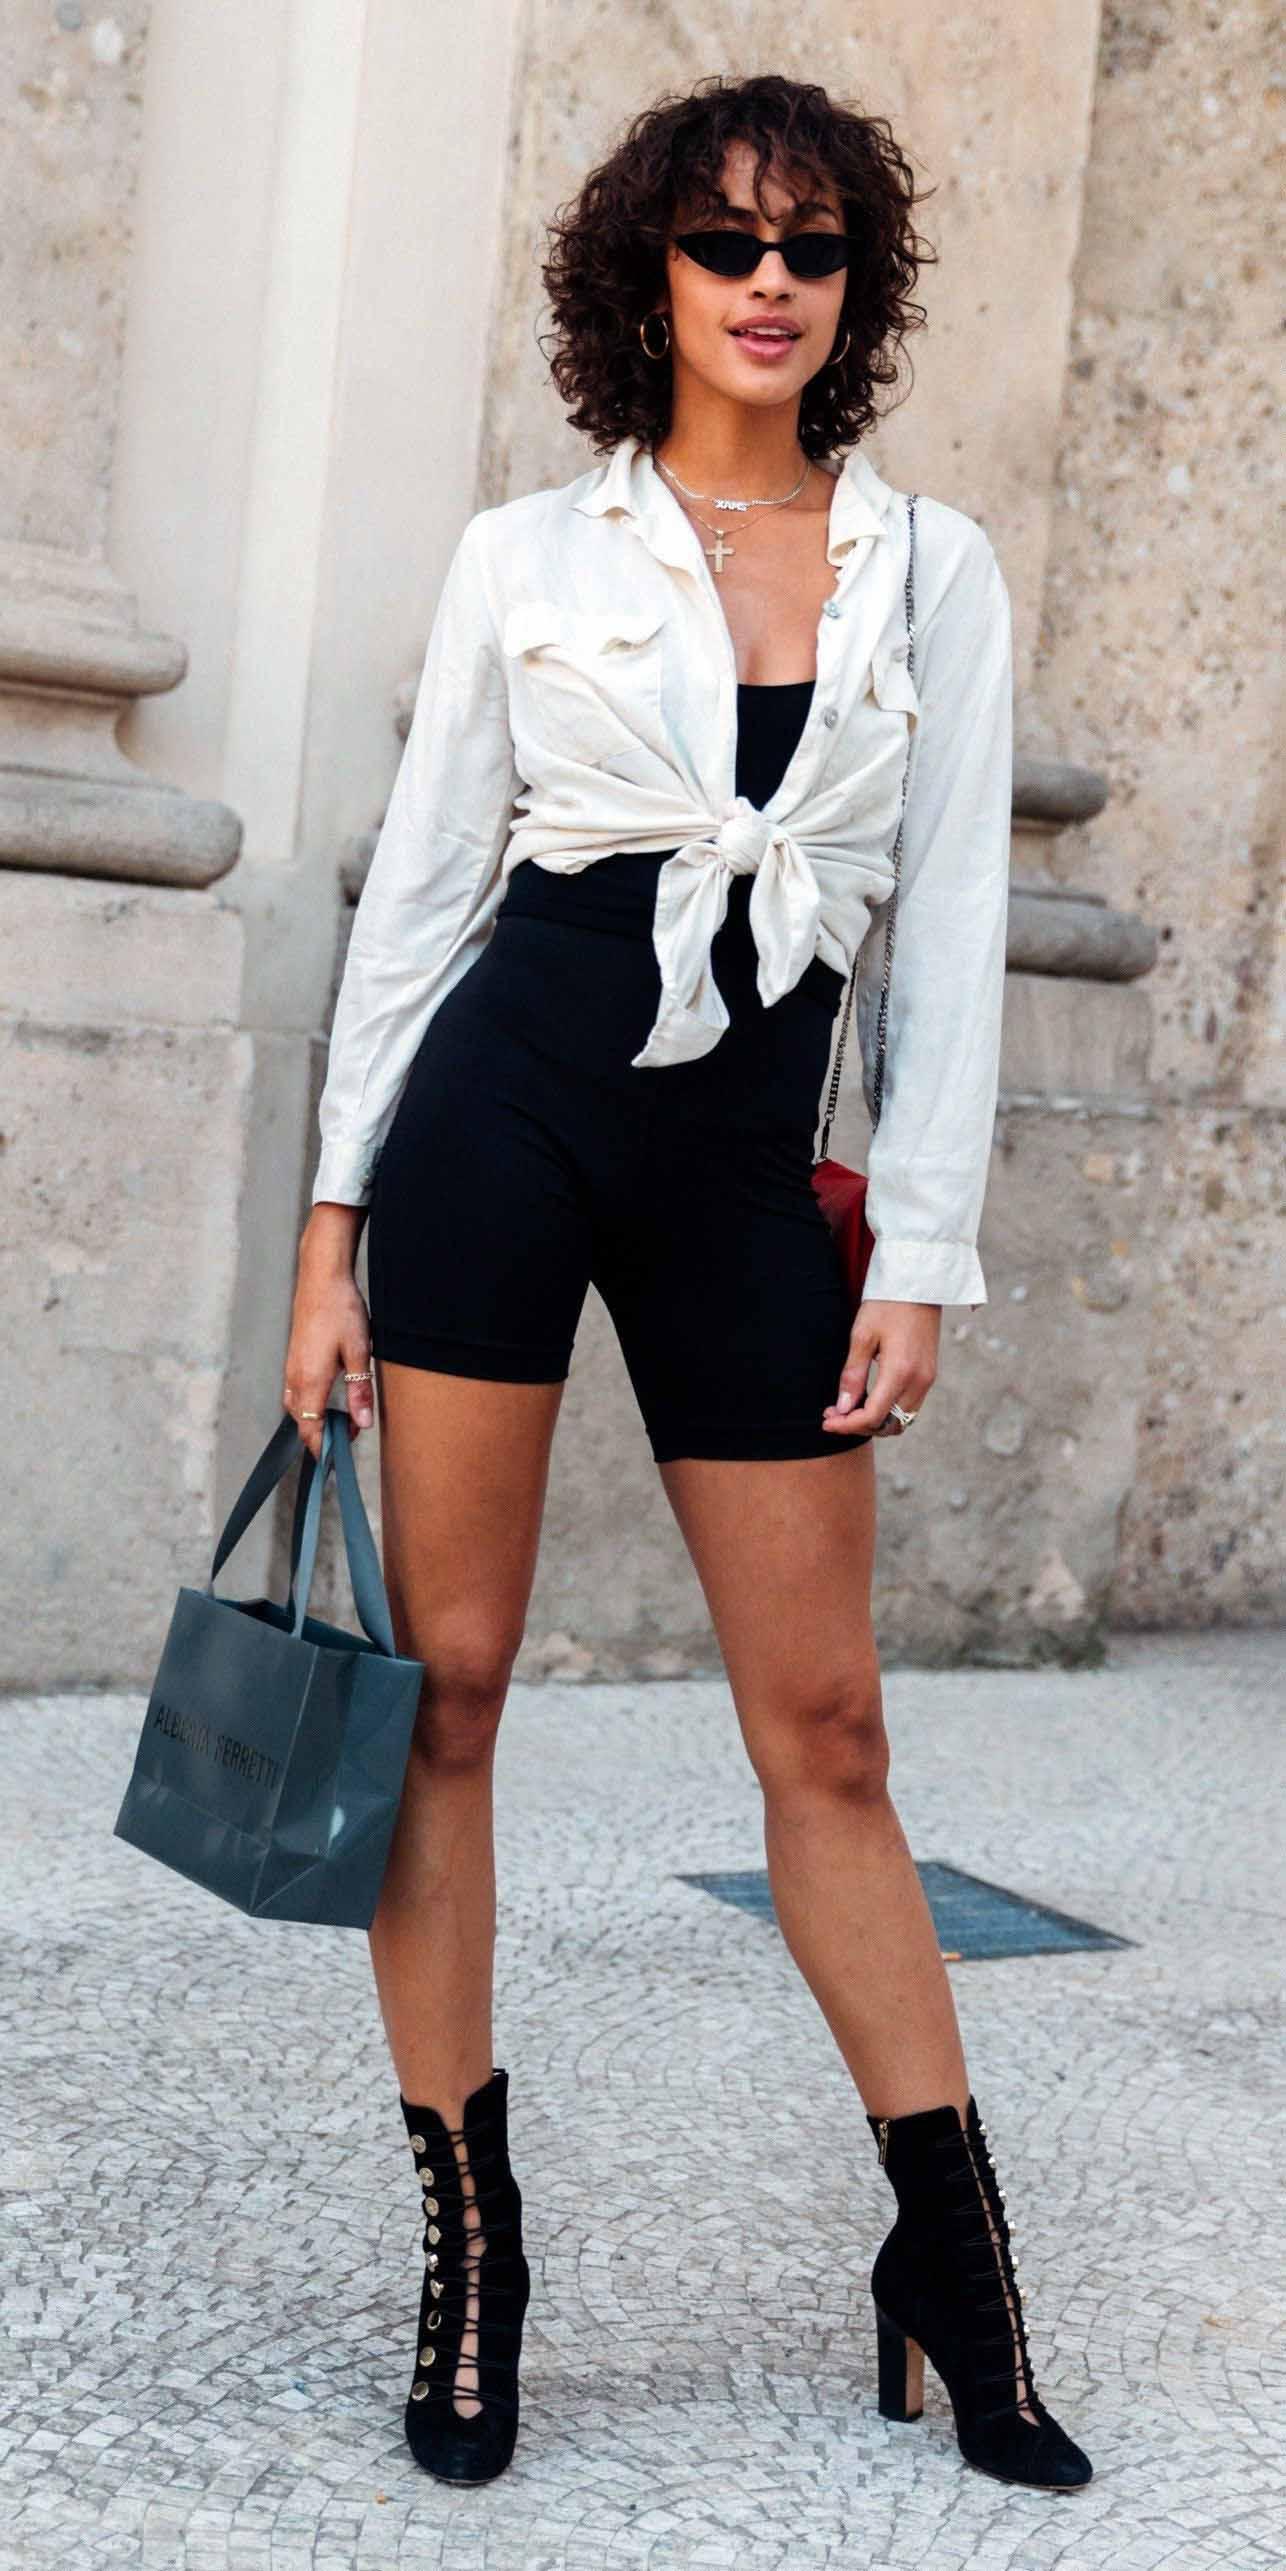 black-shorts-cycling-bike-white-collared-shirt-necklace-brun-sun-black-shoe-booties-spring-summer-lunch.jpg